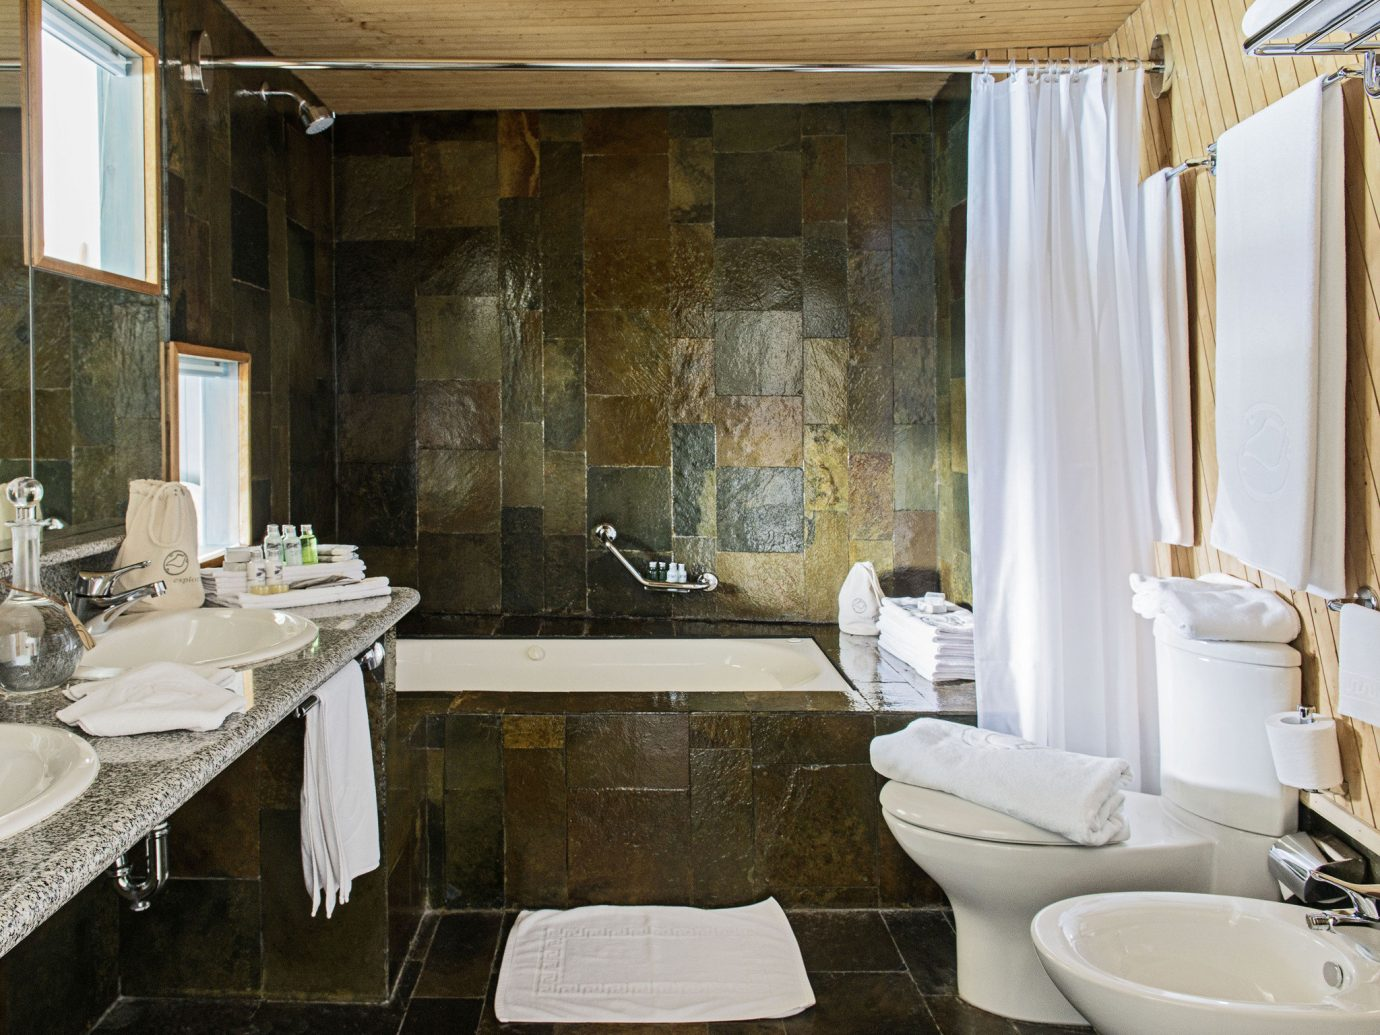 All-Inclusive Resorts Hotels Luxury Travel indoor bathroom sink room window property estate interior design home floor Suite counter Design toilet tub bathtub Bath tiled